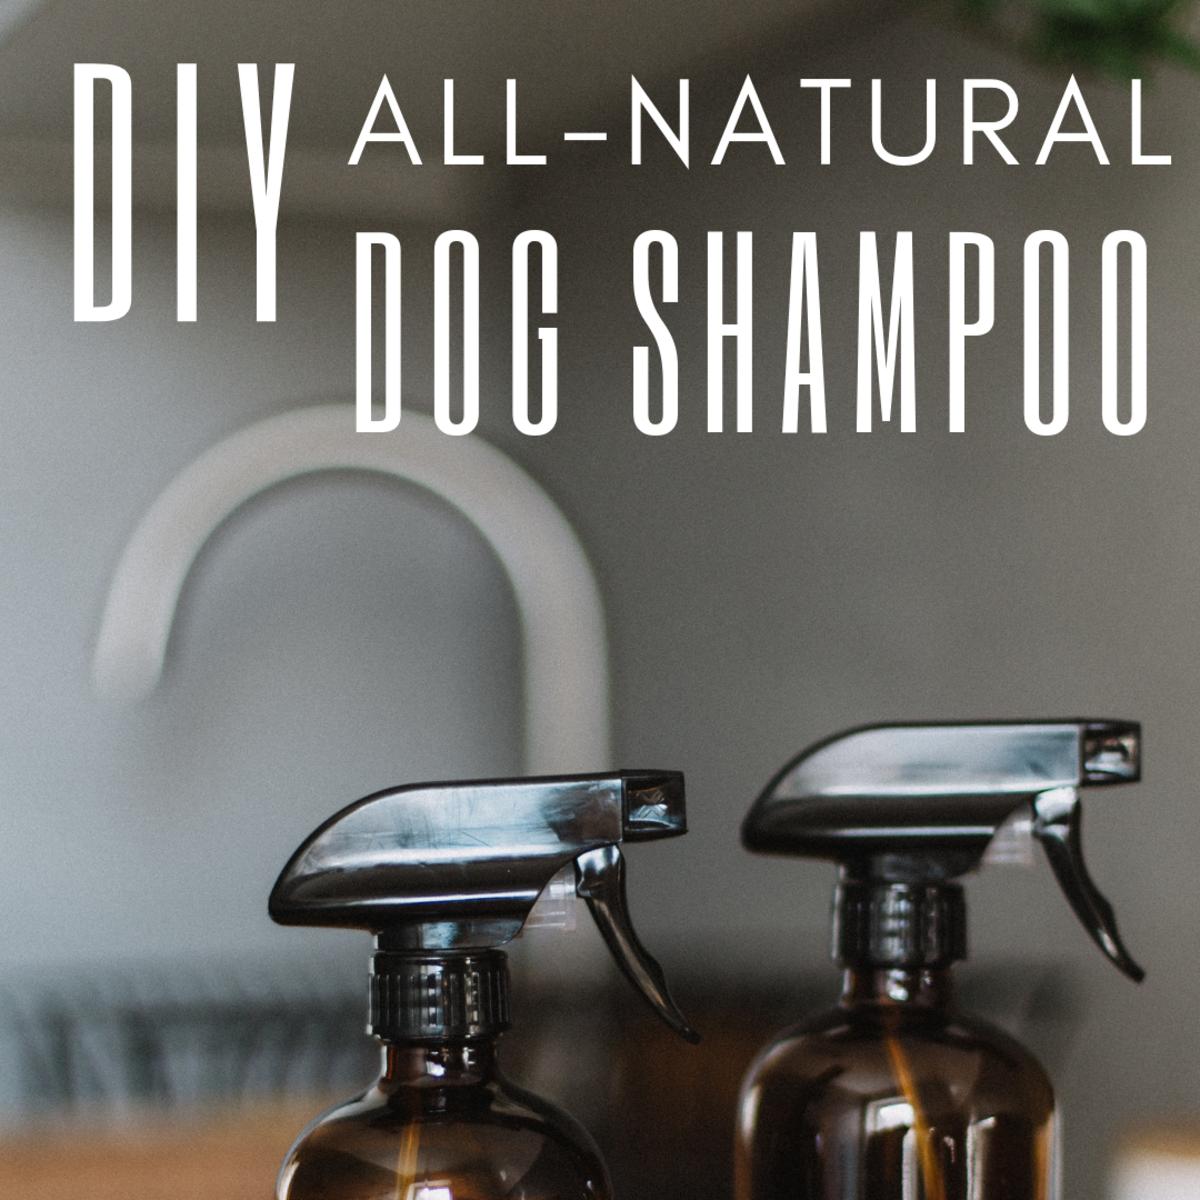 DIY Dog Shampoo Recipe